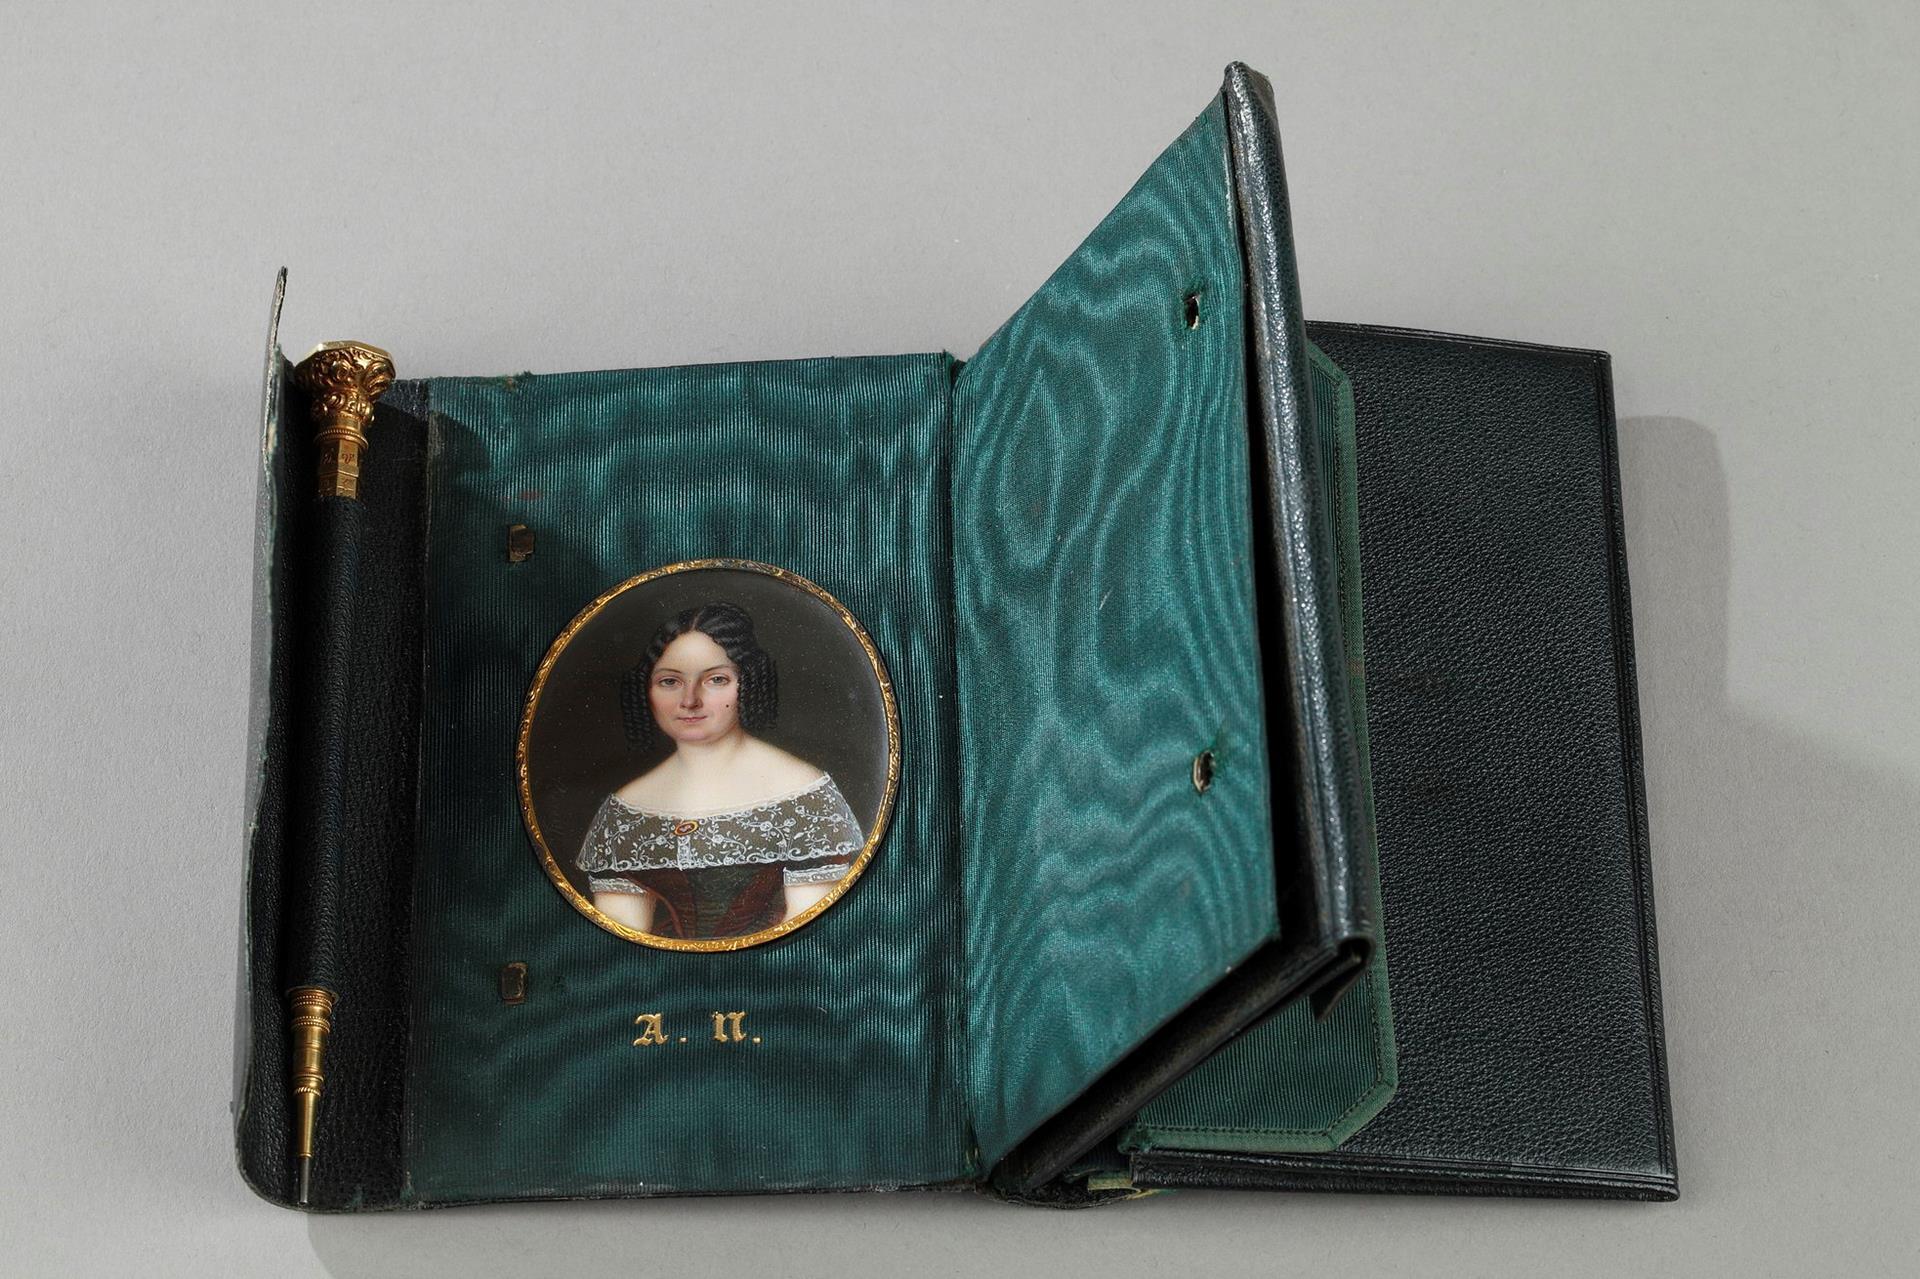 Leather case with miniature signed Berny d'Ouvillé